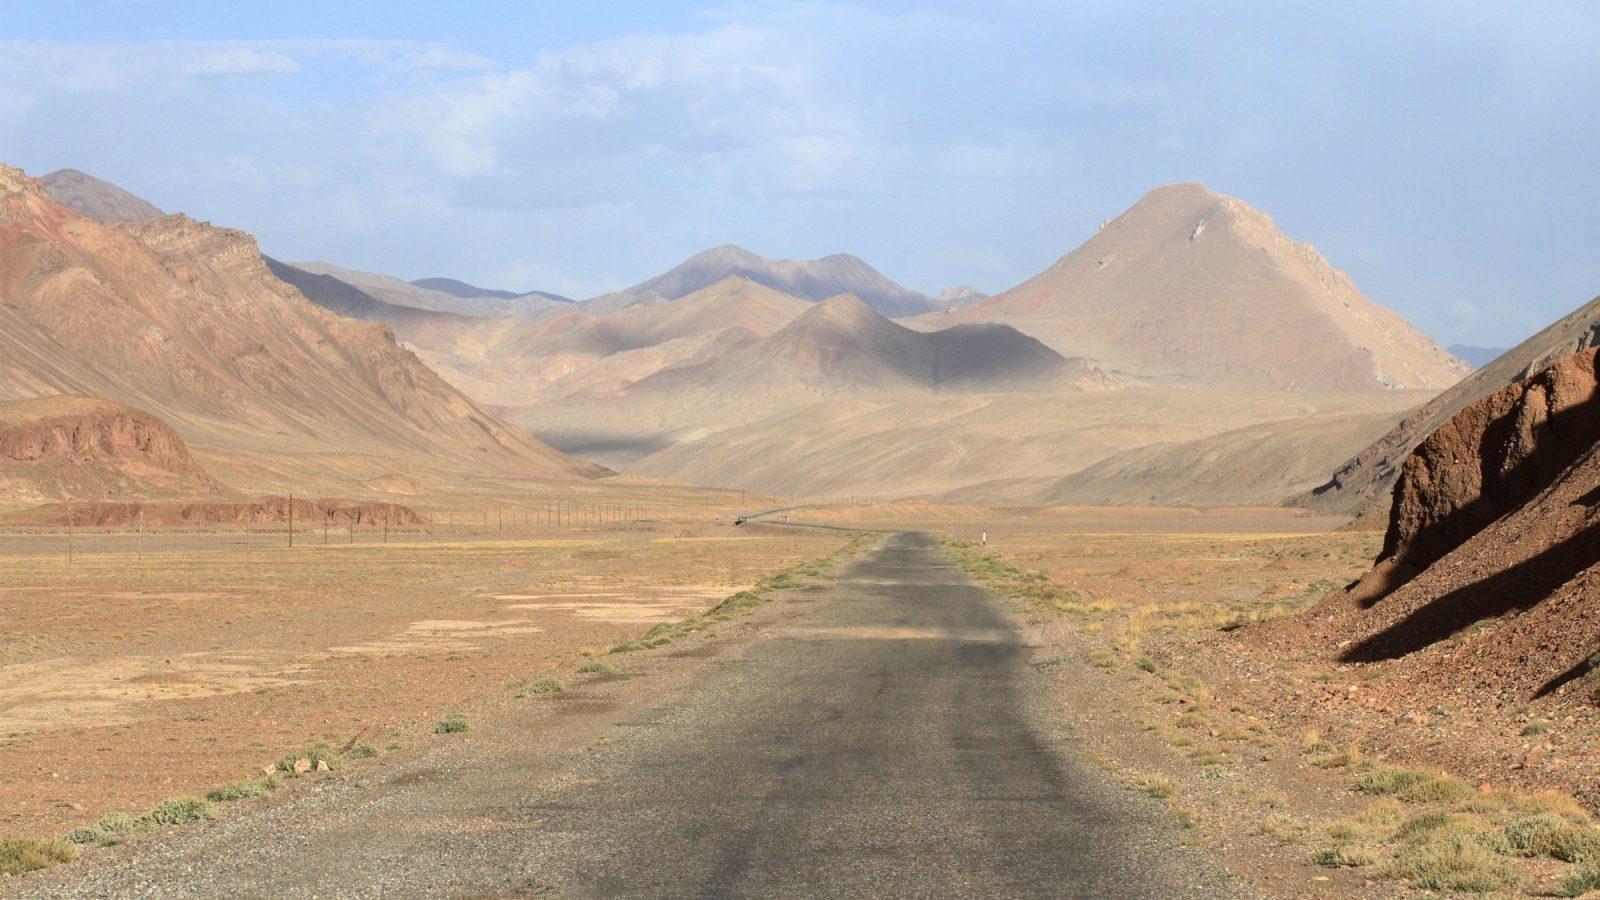 Na M41, na Pamirski cesti